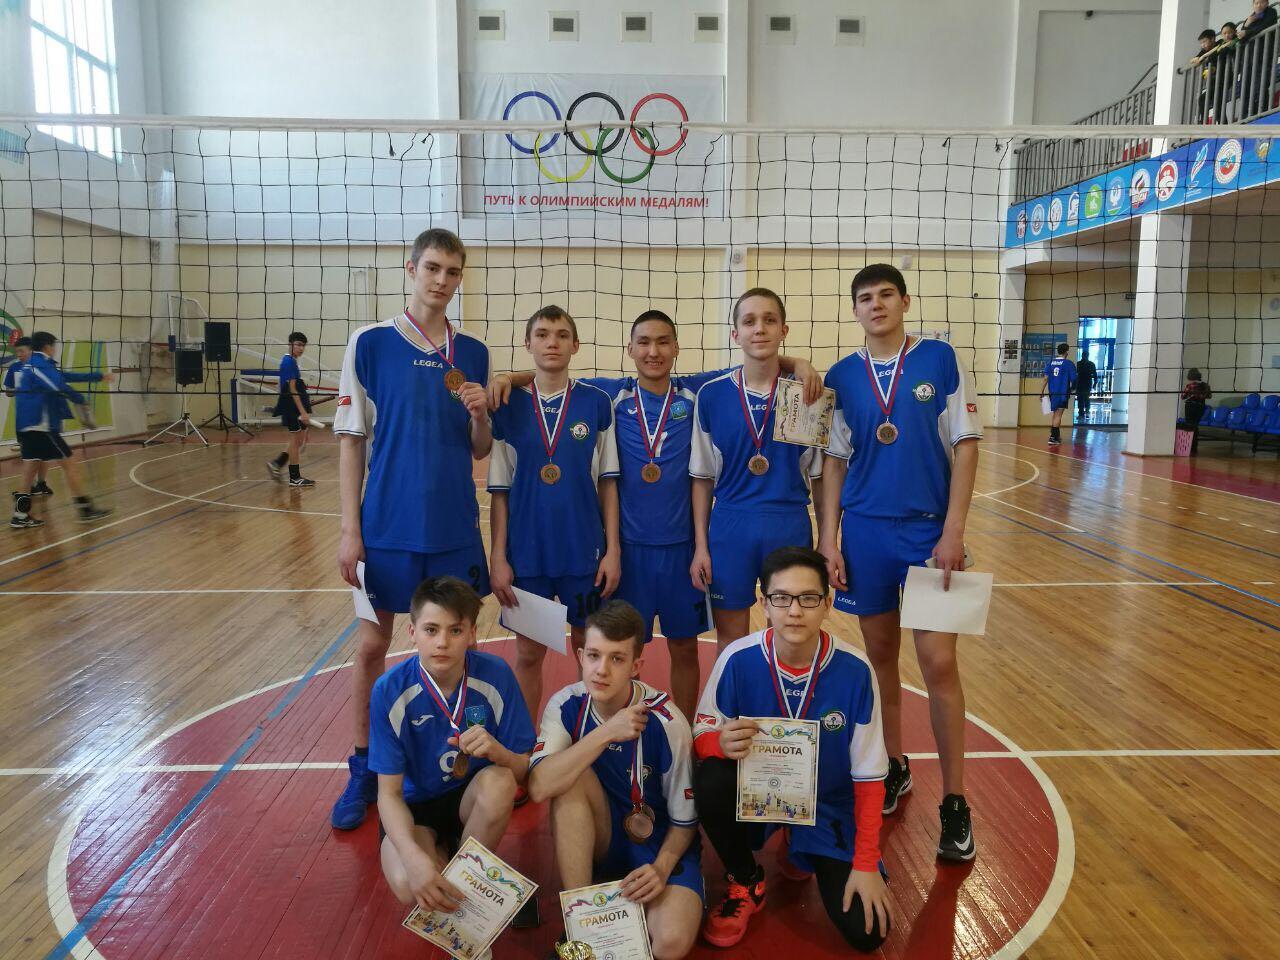 Первенство РС (Я) по волейболу